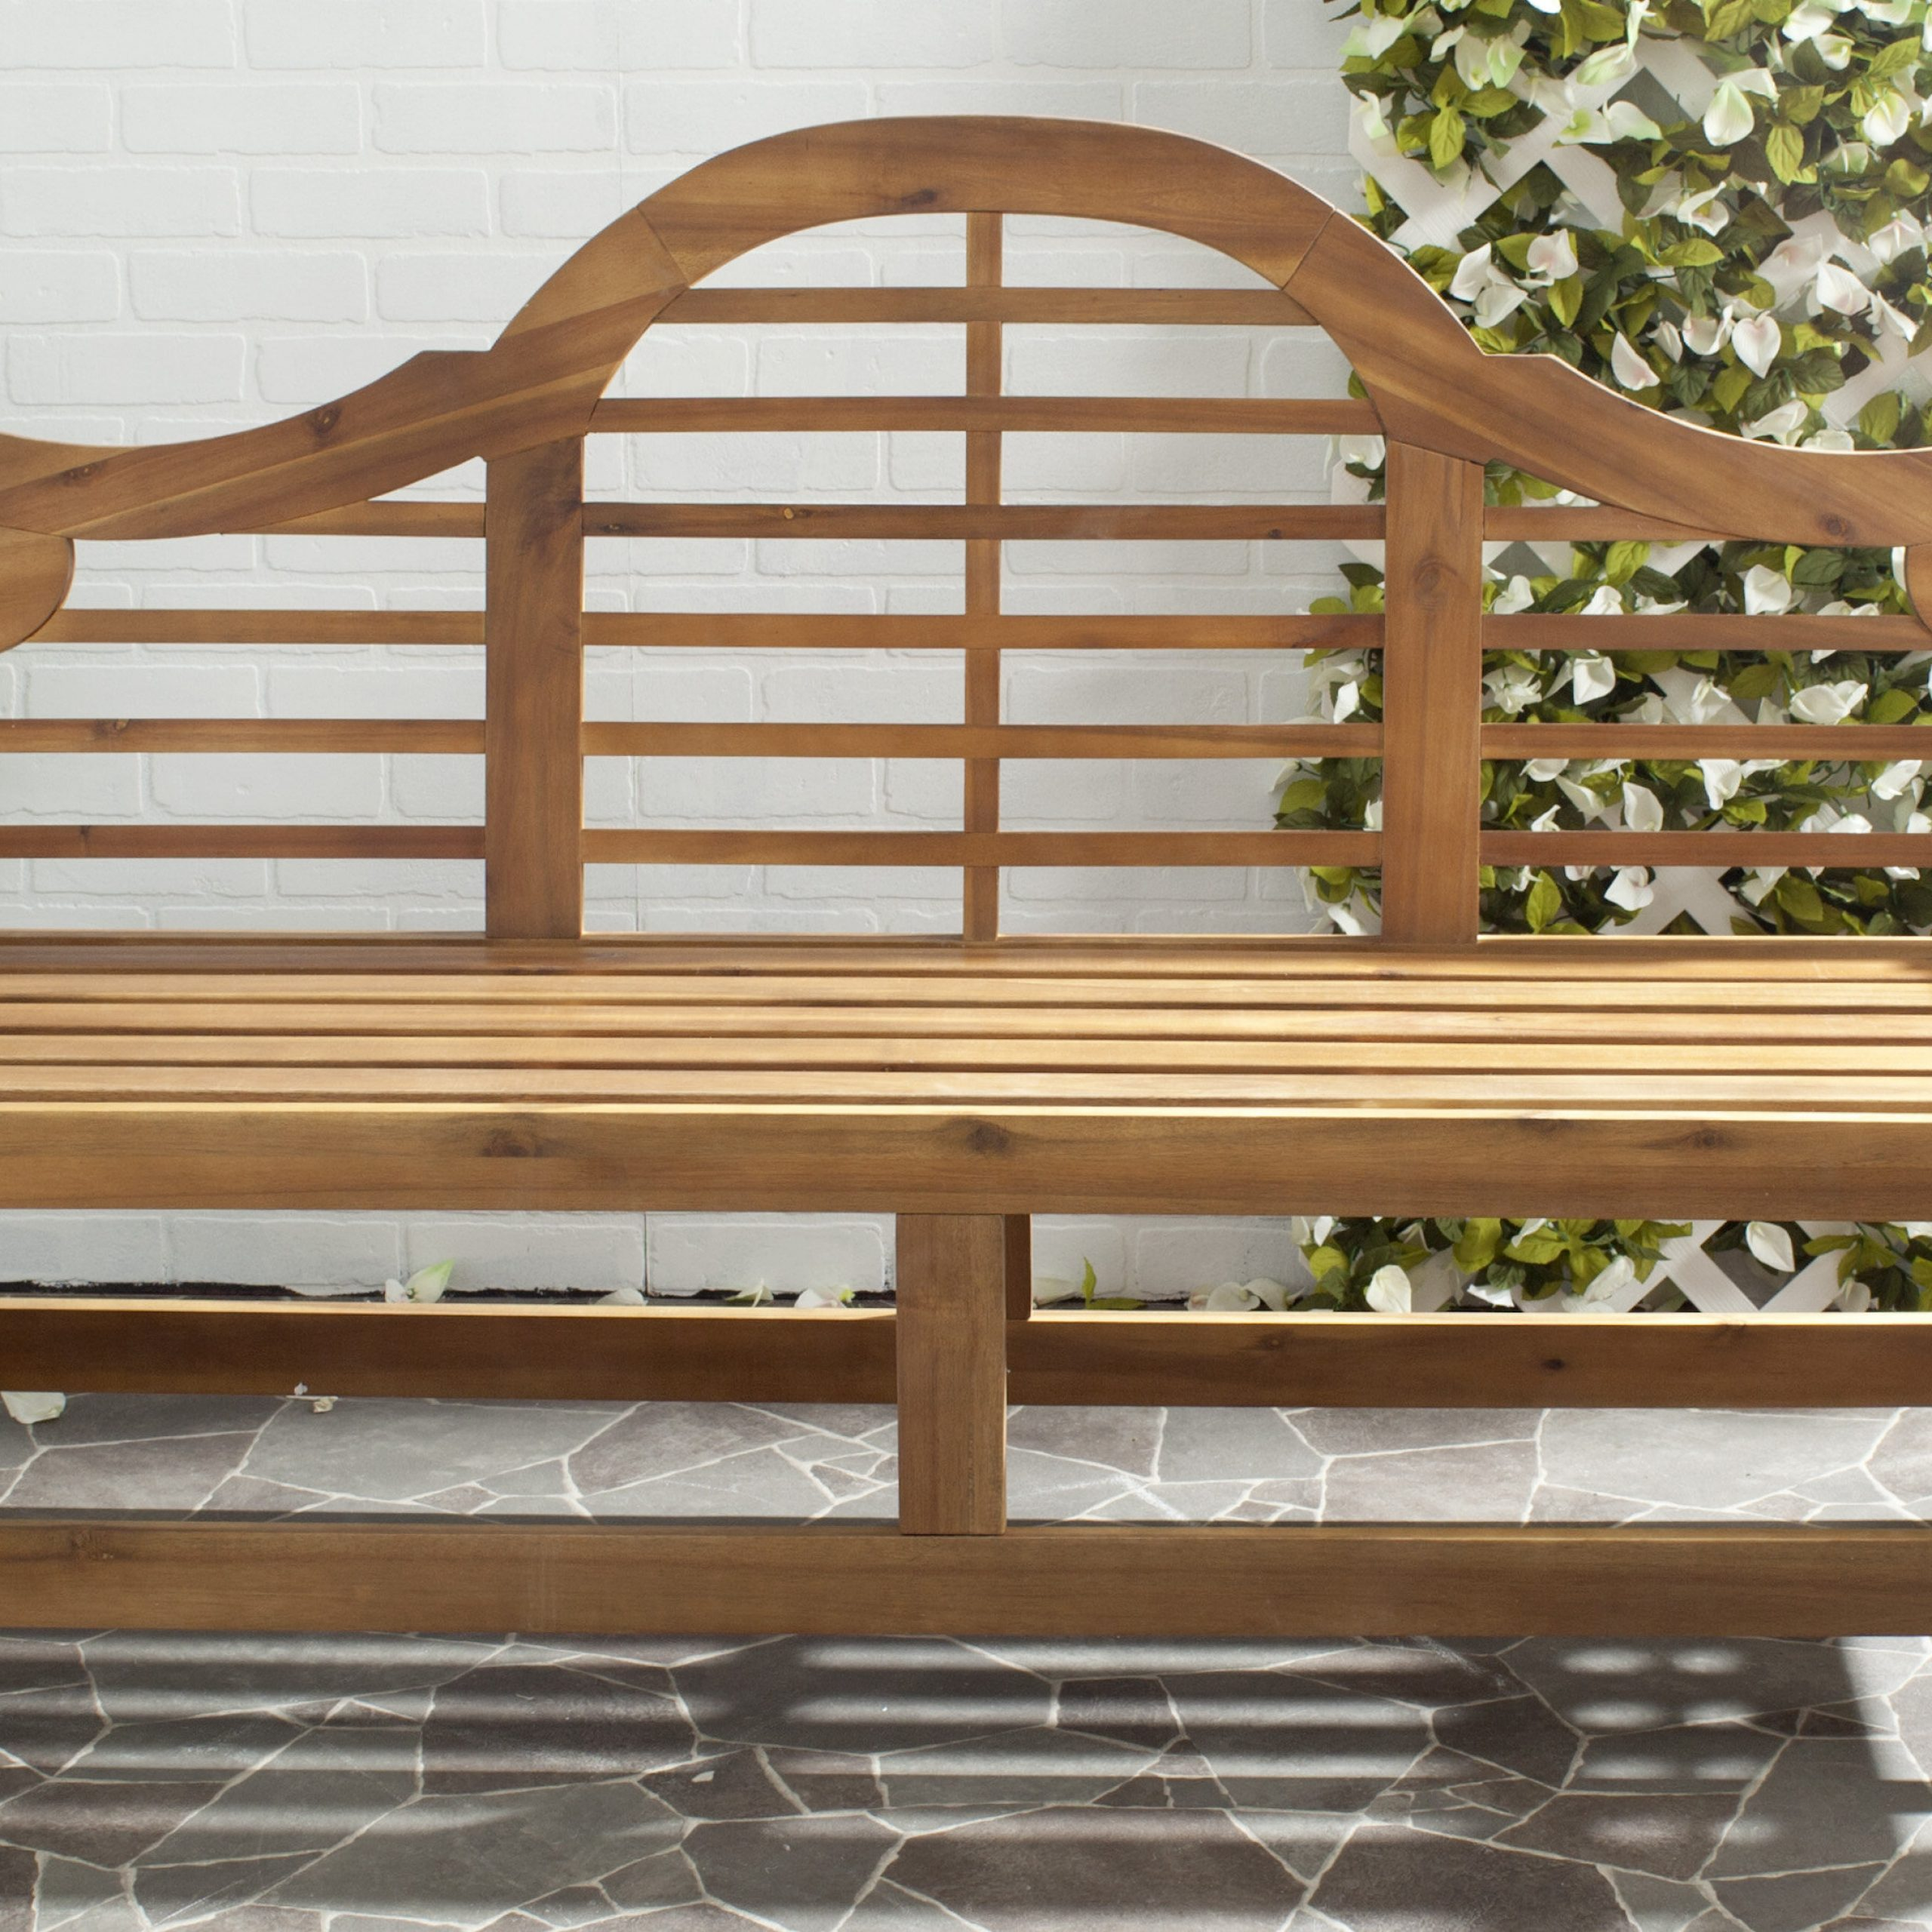 Gabbert Wooden Garden Benches Pertaining To Best And Newest Ziemer Wooden Garden Bench (View 7 of 30)